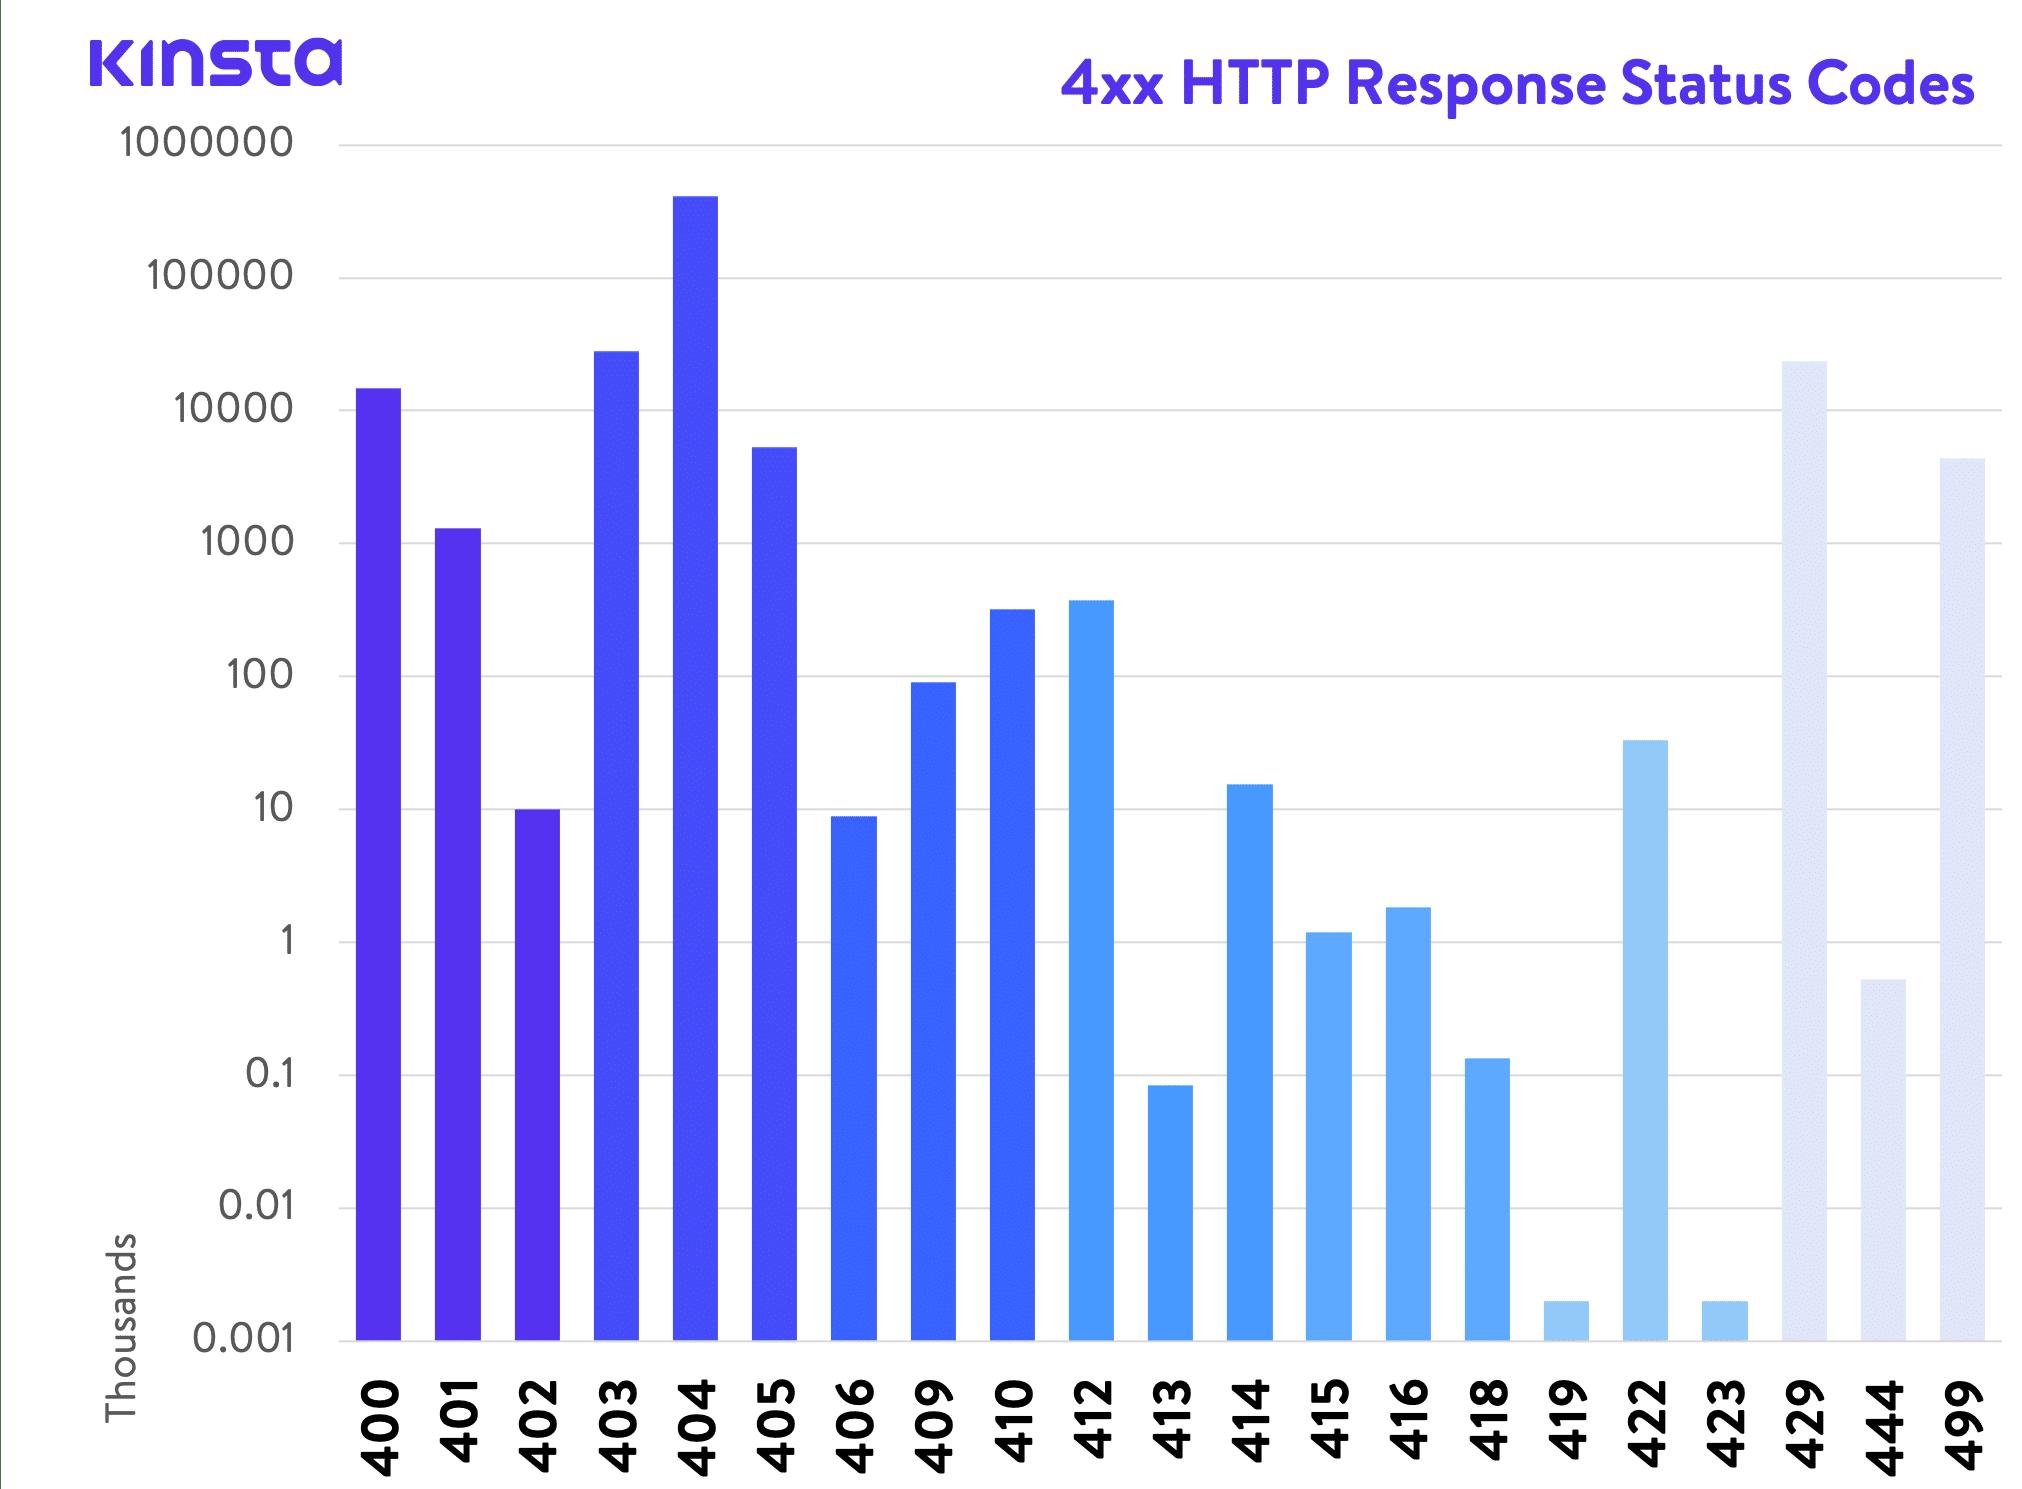 4xx HTTP response status codes